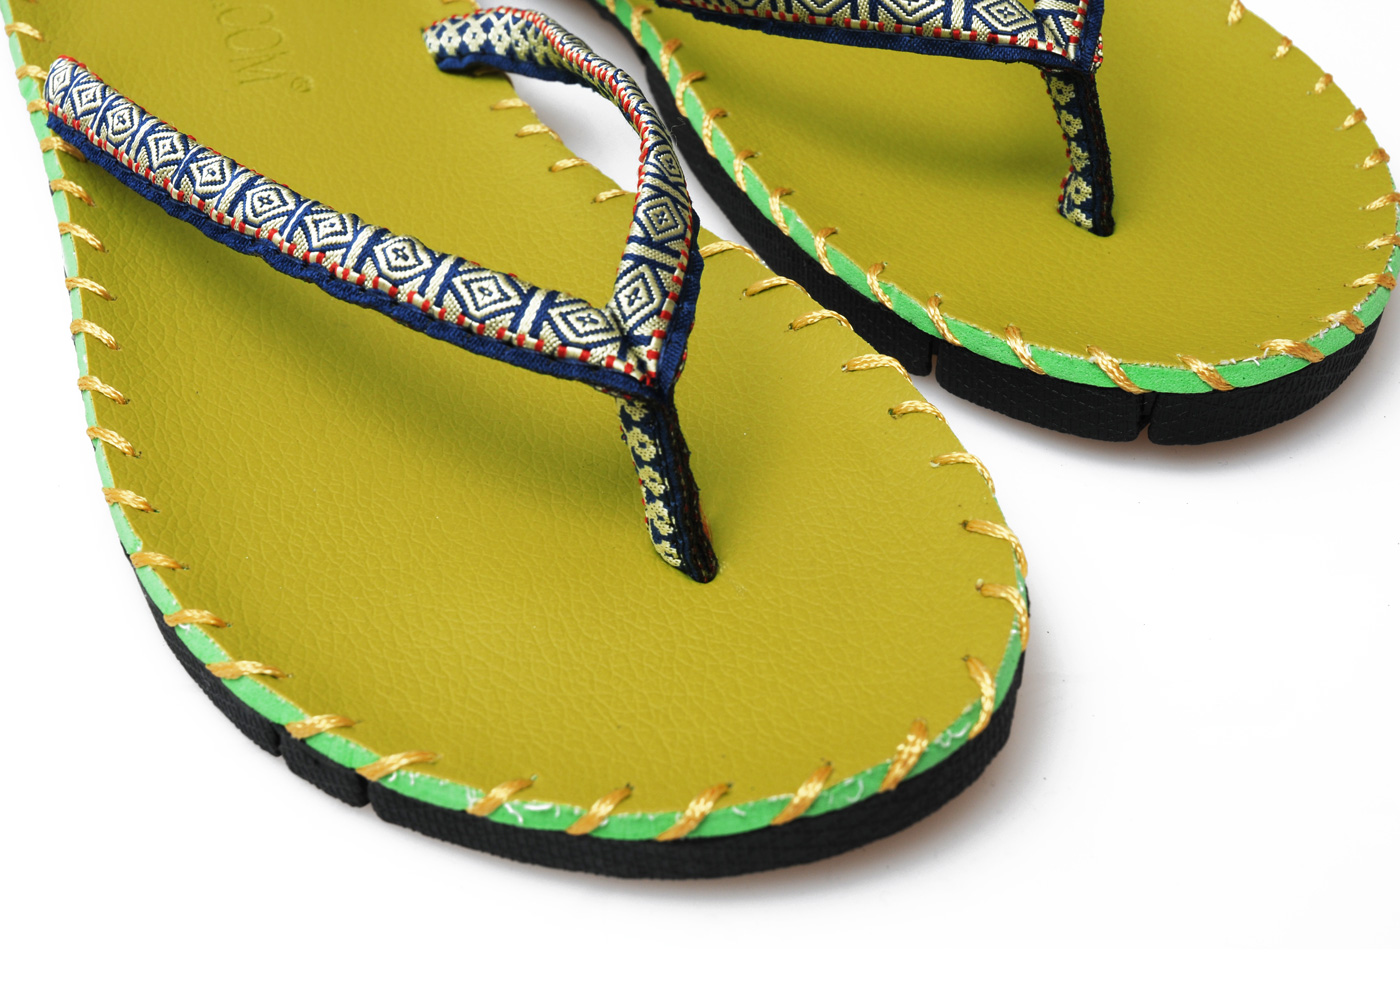 Yoga sandals - green